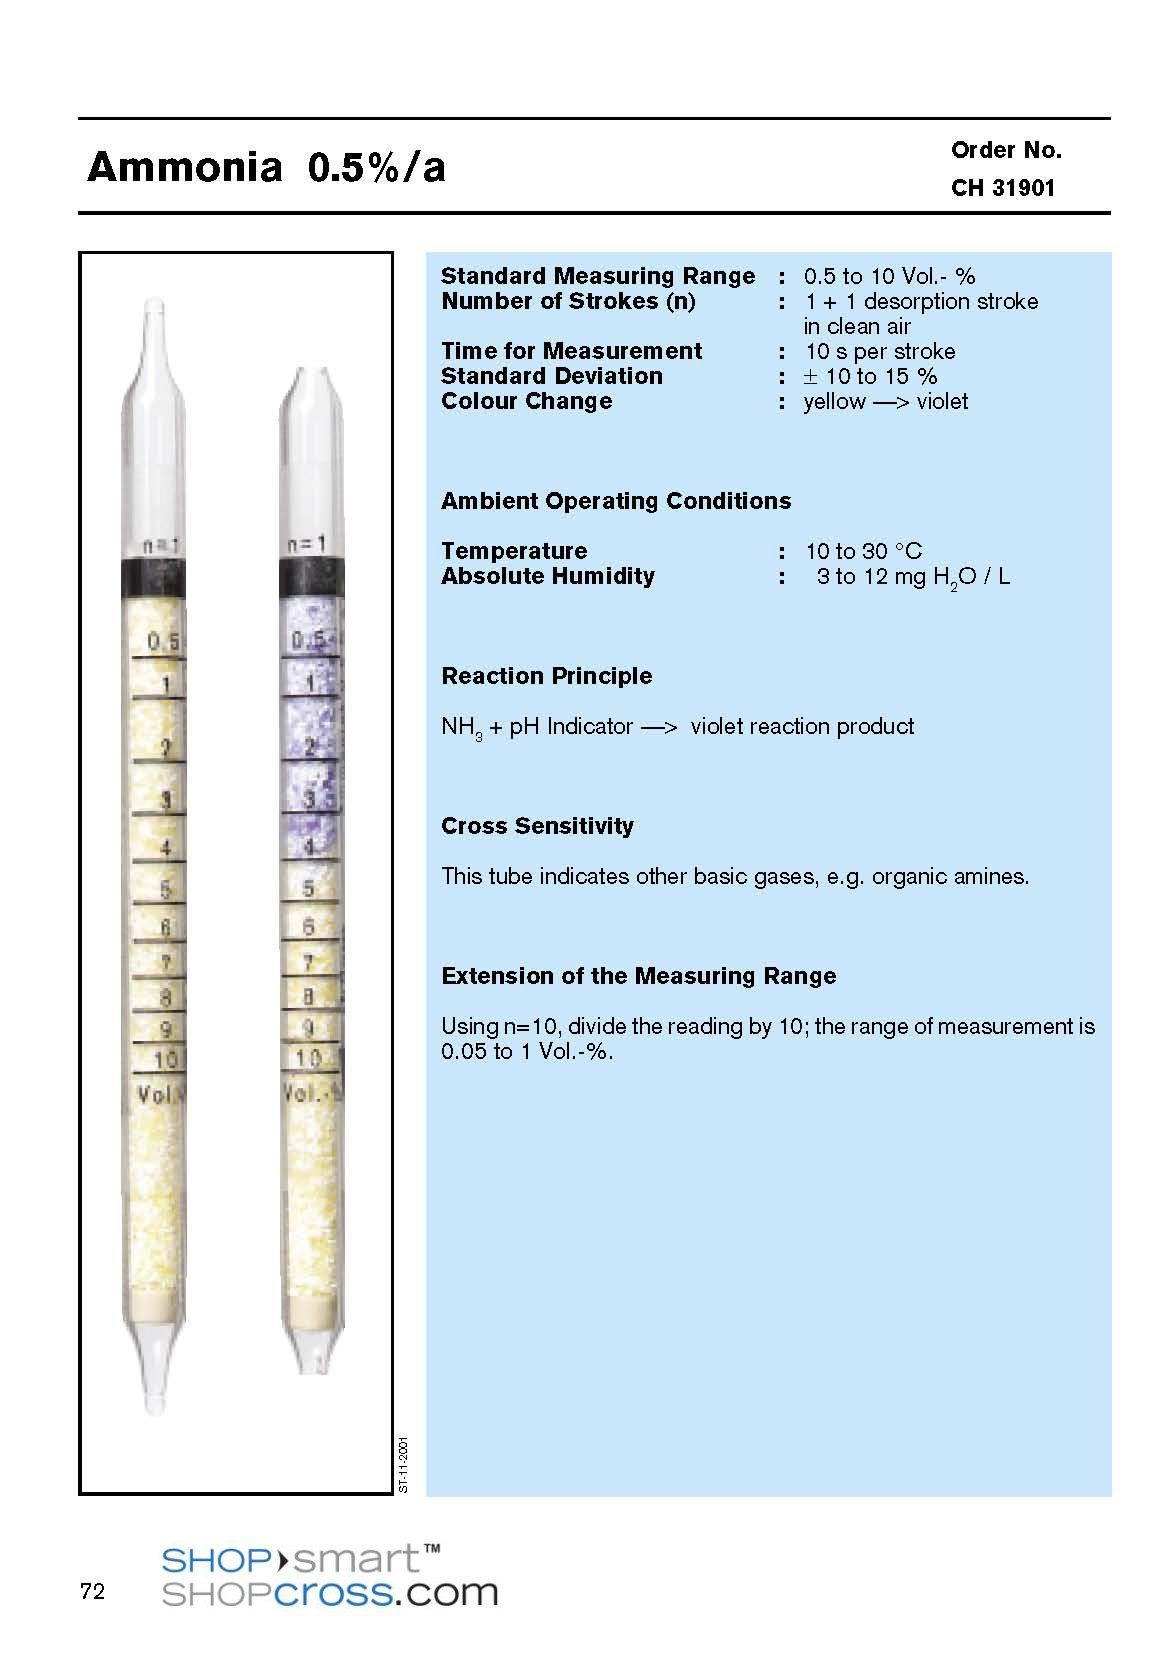 Ammonia 0.5%/a CH31901 Draeger Tube by Dräger (Image #1)